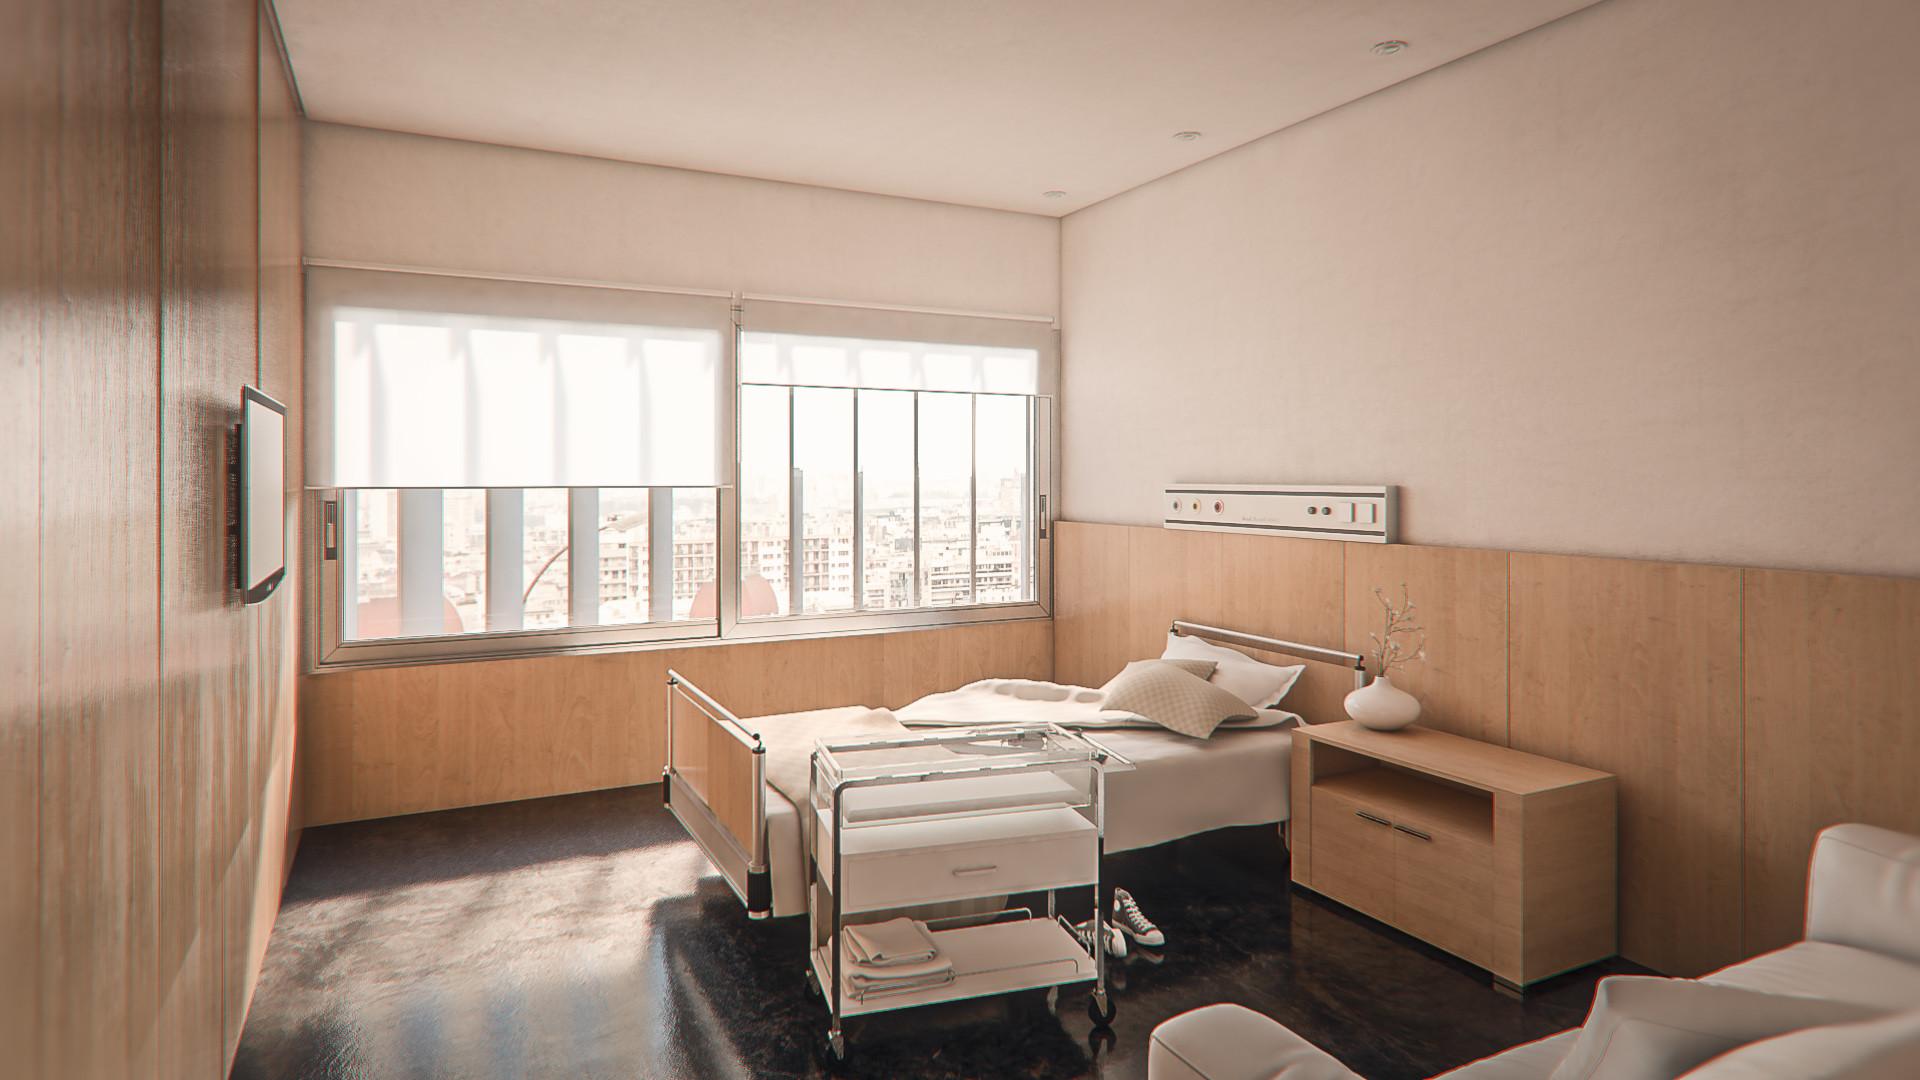 Bruno bolognesi habitacion